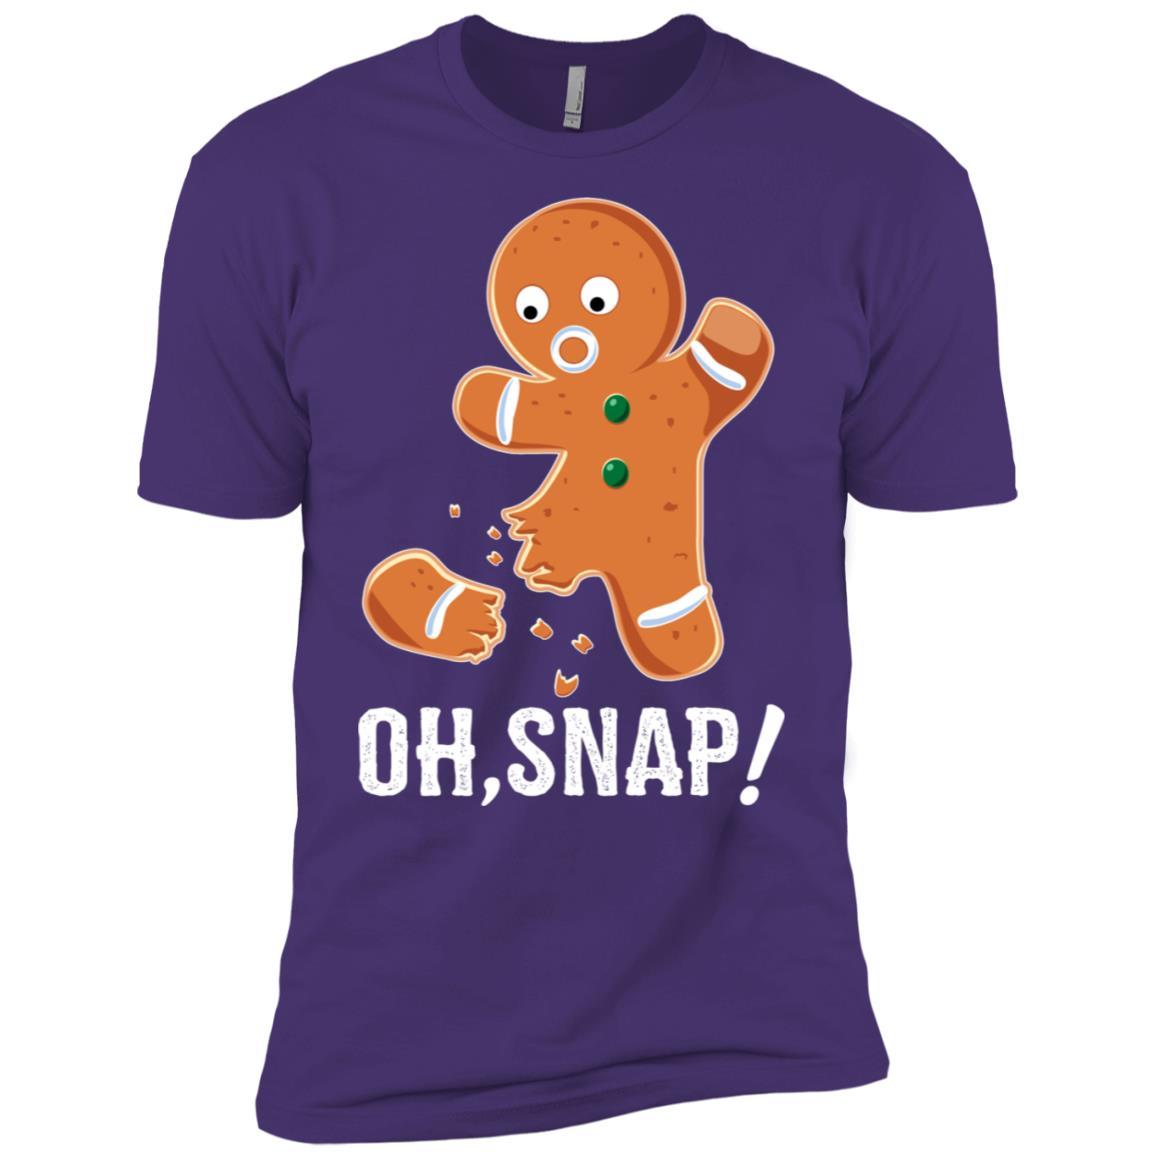 Funny Gingerbread Cookie Baking Humor Men Short Sleeve T-Shirt